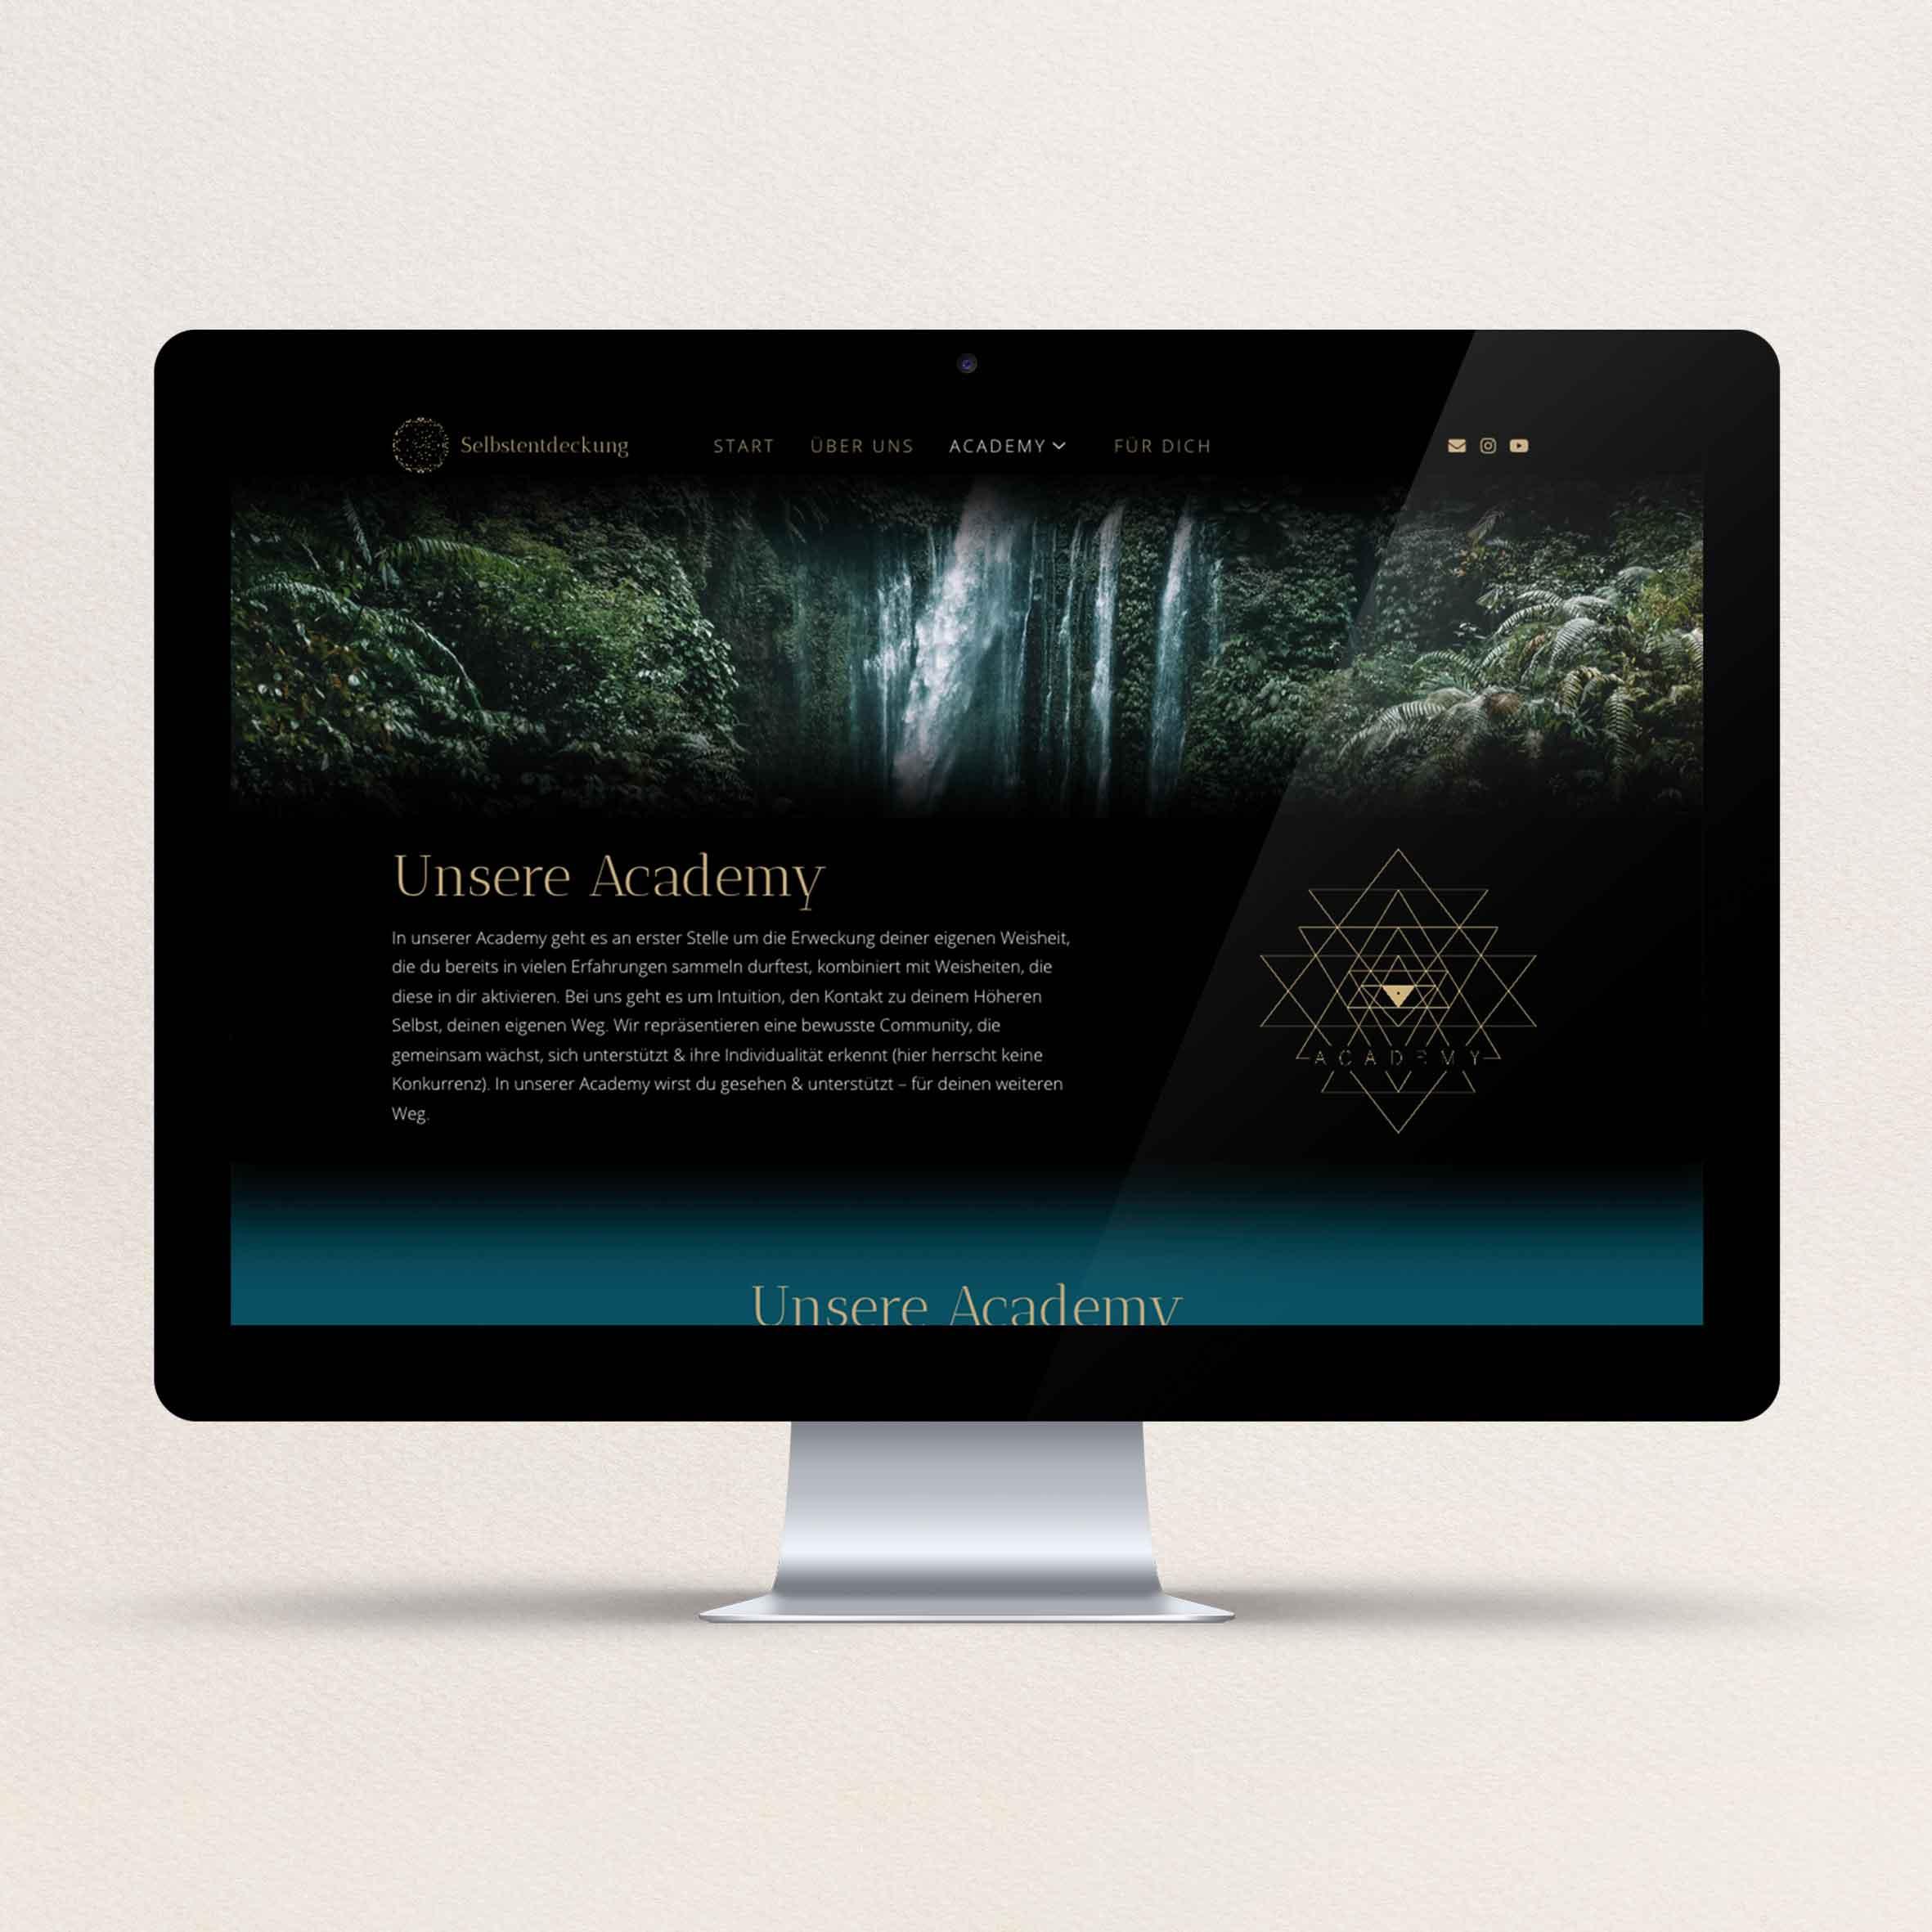 nesaja_portfolio_selbstentdeckung_web_desktop_2